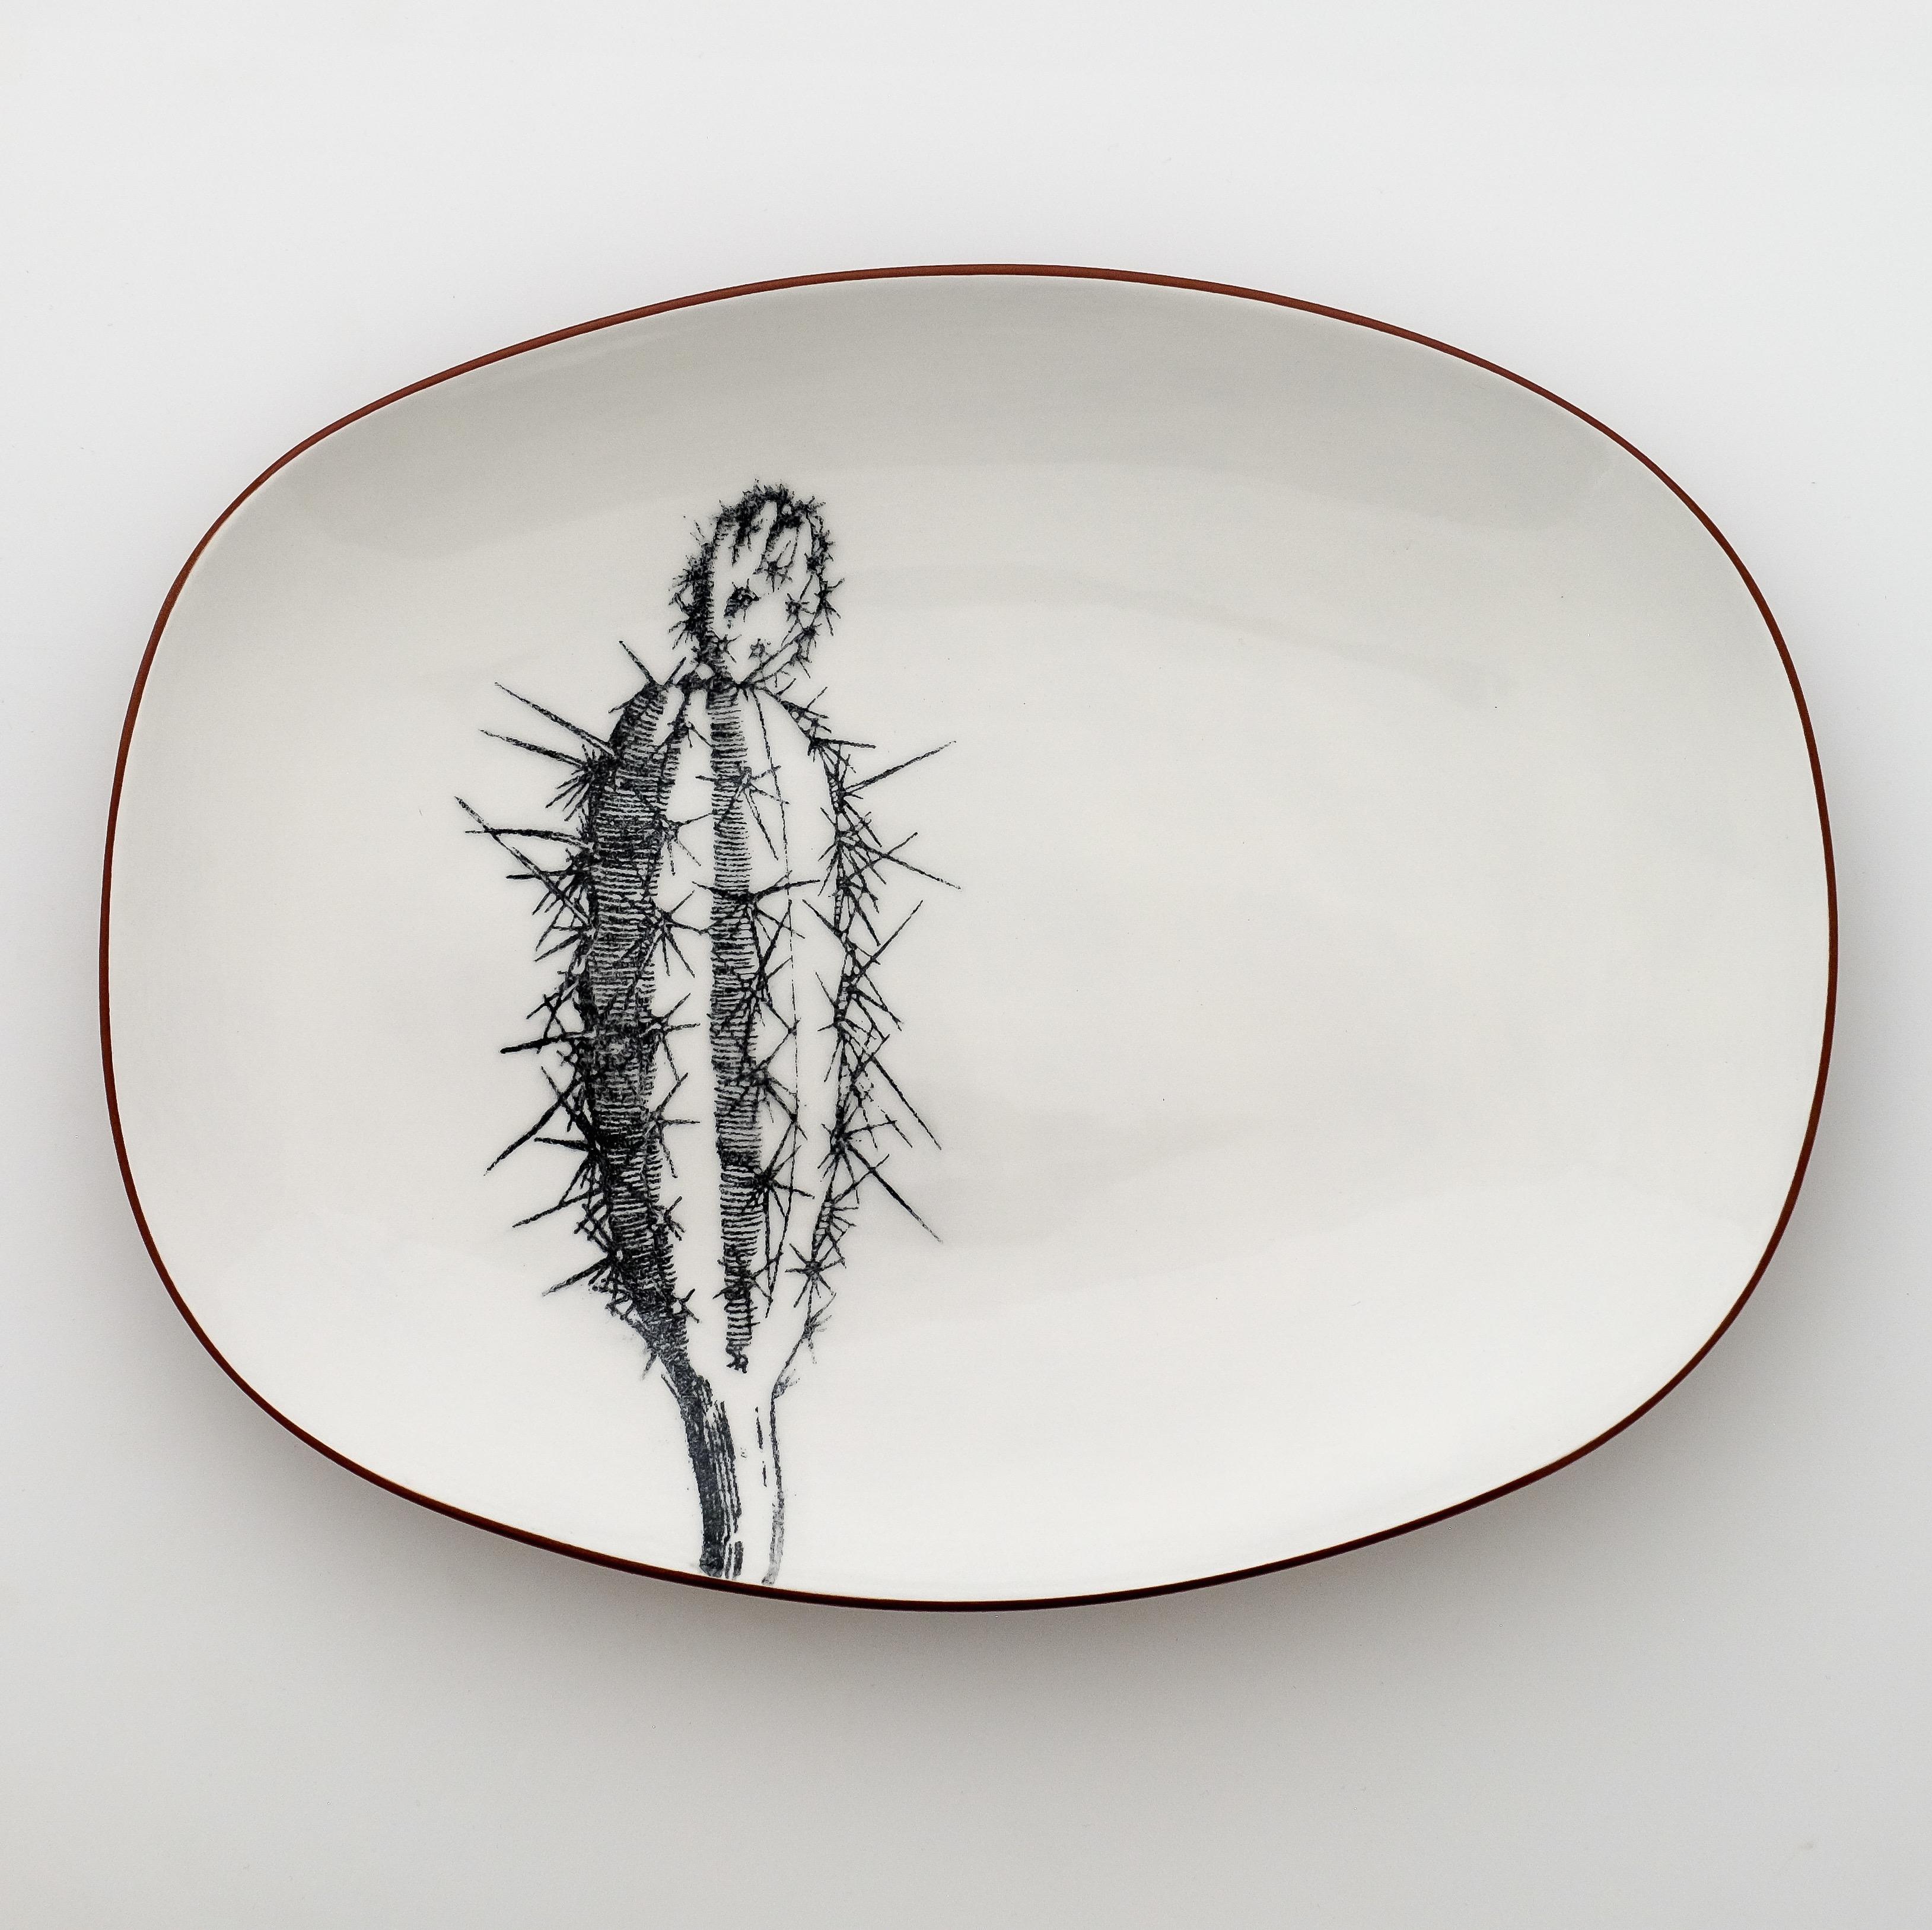 cactus oval dish